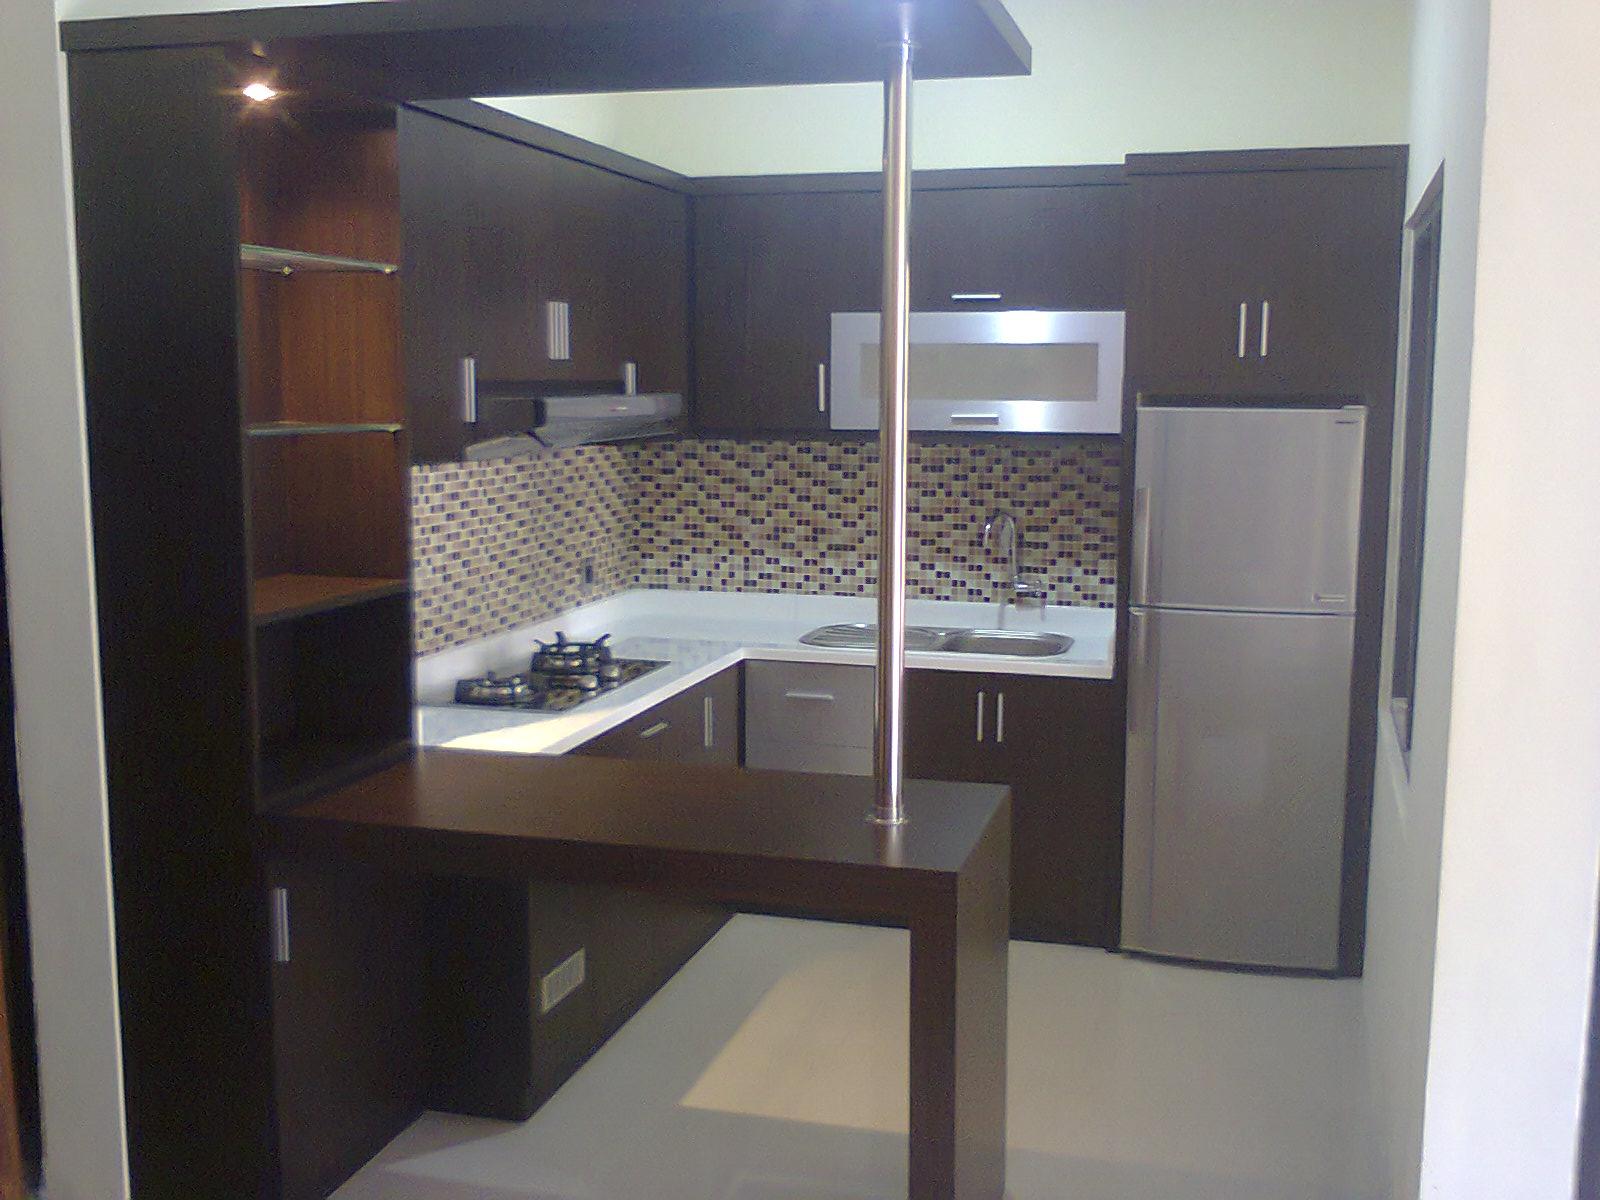 kontraktor interior surabaya sidoarjo harga kitchen set minimalis sidoarjo. Black Bedroom Furniture Sets. Home Design Ideas